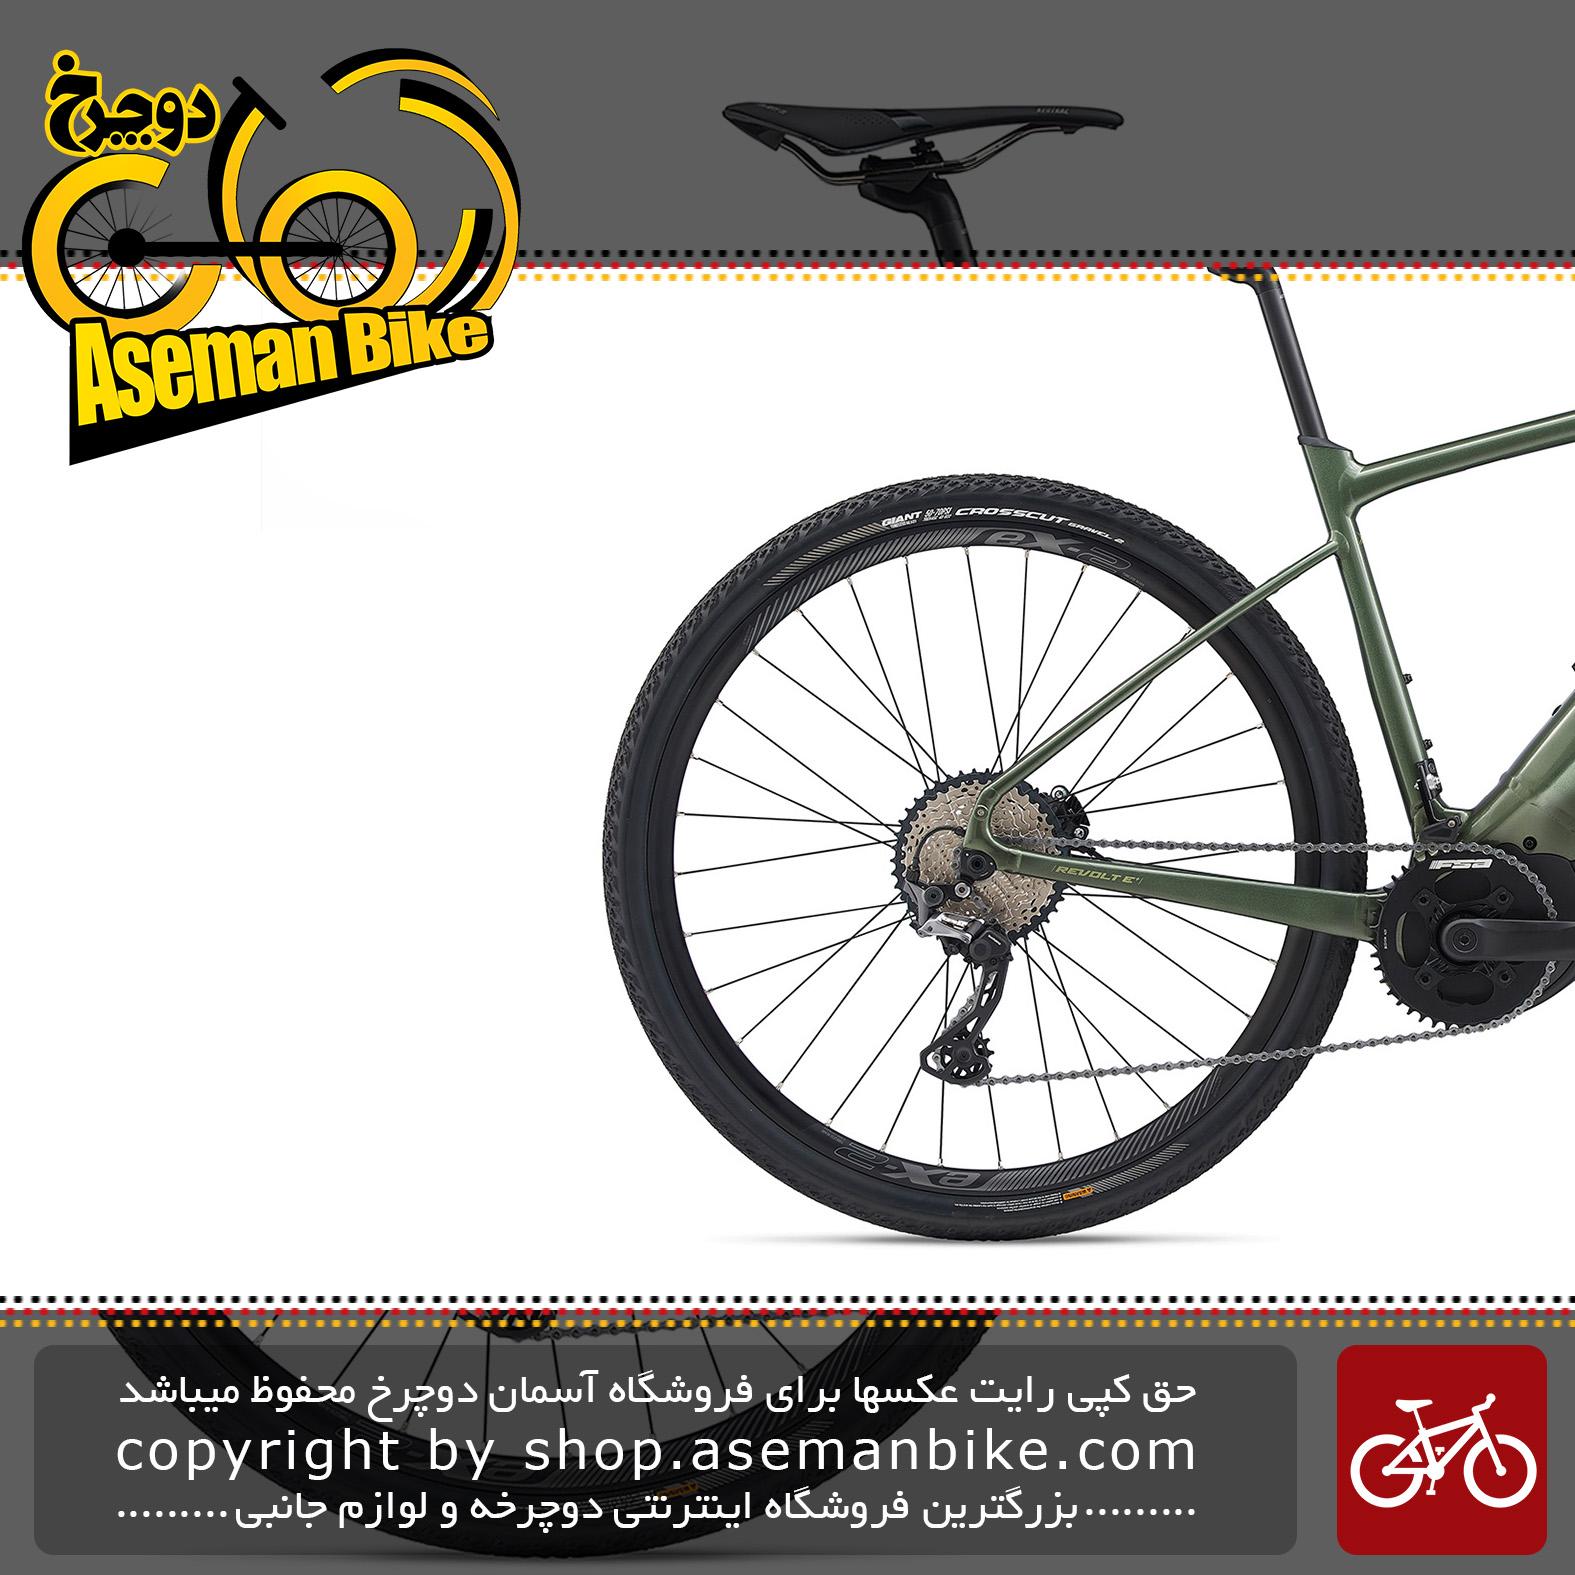 دوچرخه دومنظوره برقی جاینت مدل ریولت ای پلاس پرو 2020 Giant Transit Bicycle Revolt E+ Pro 2020